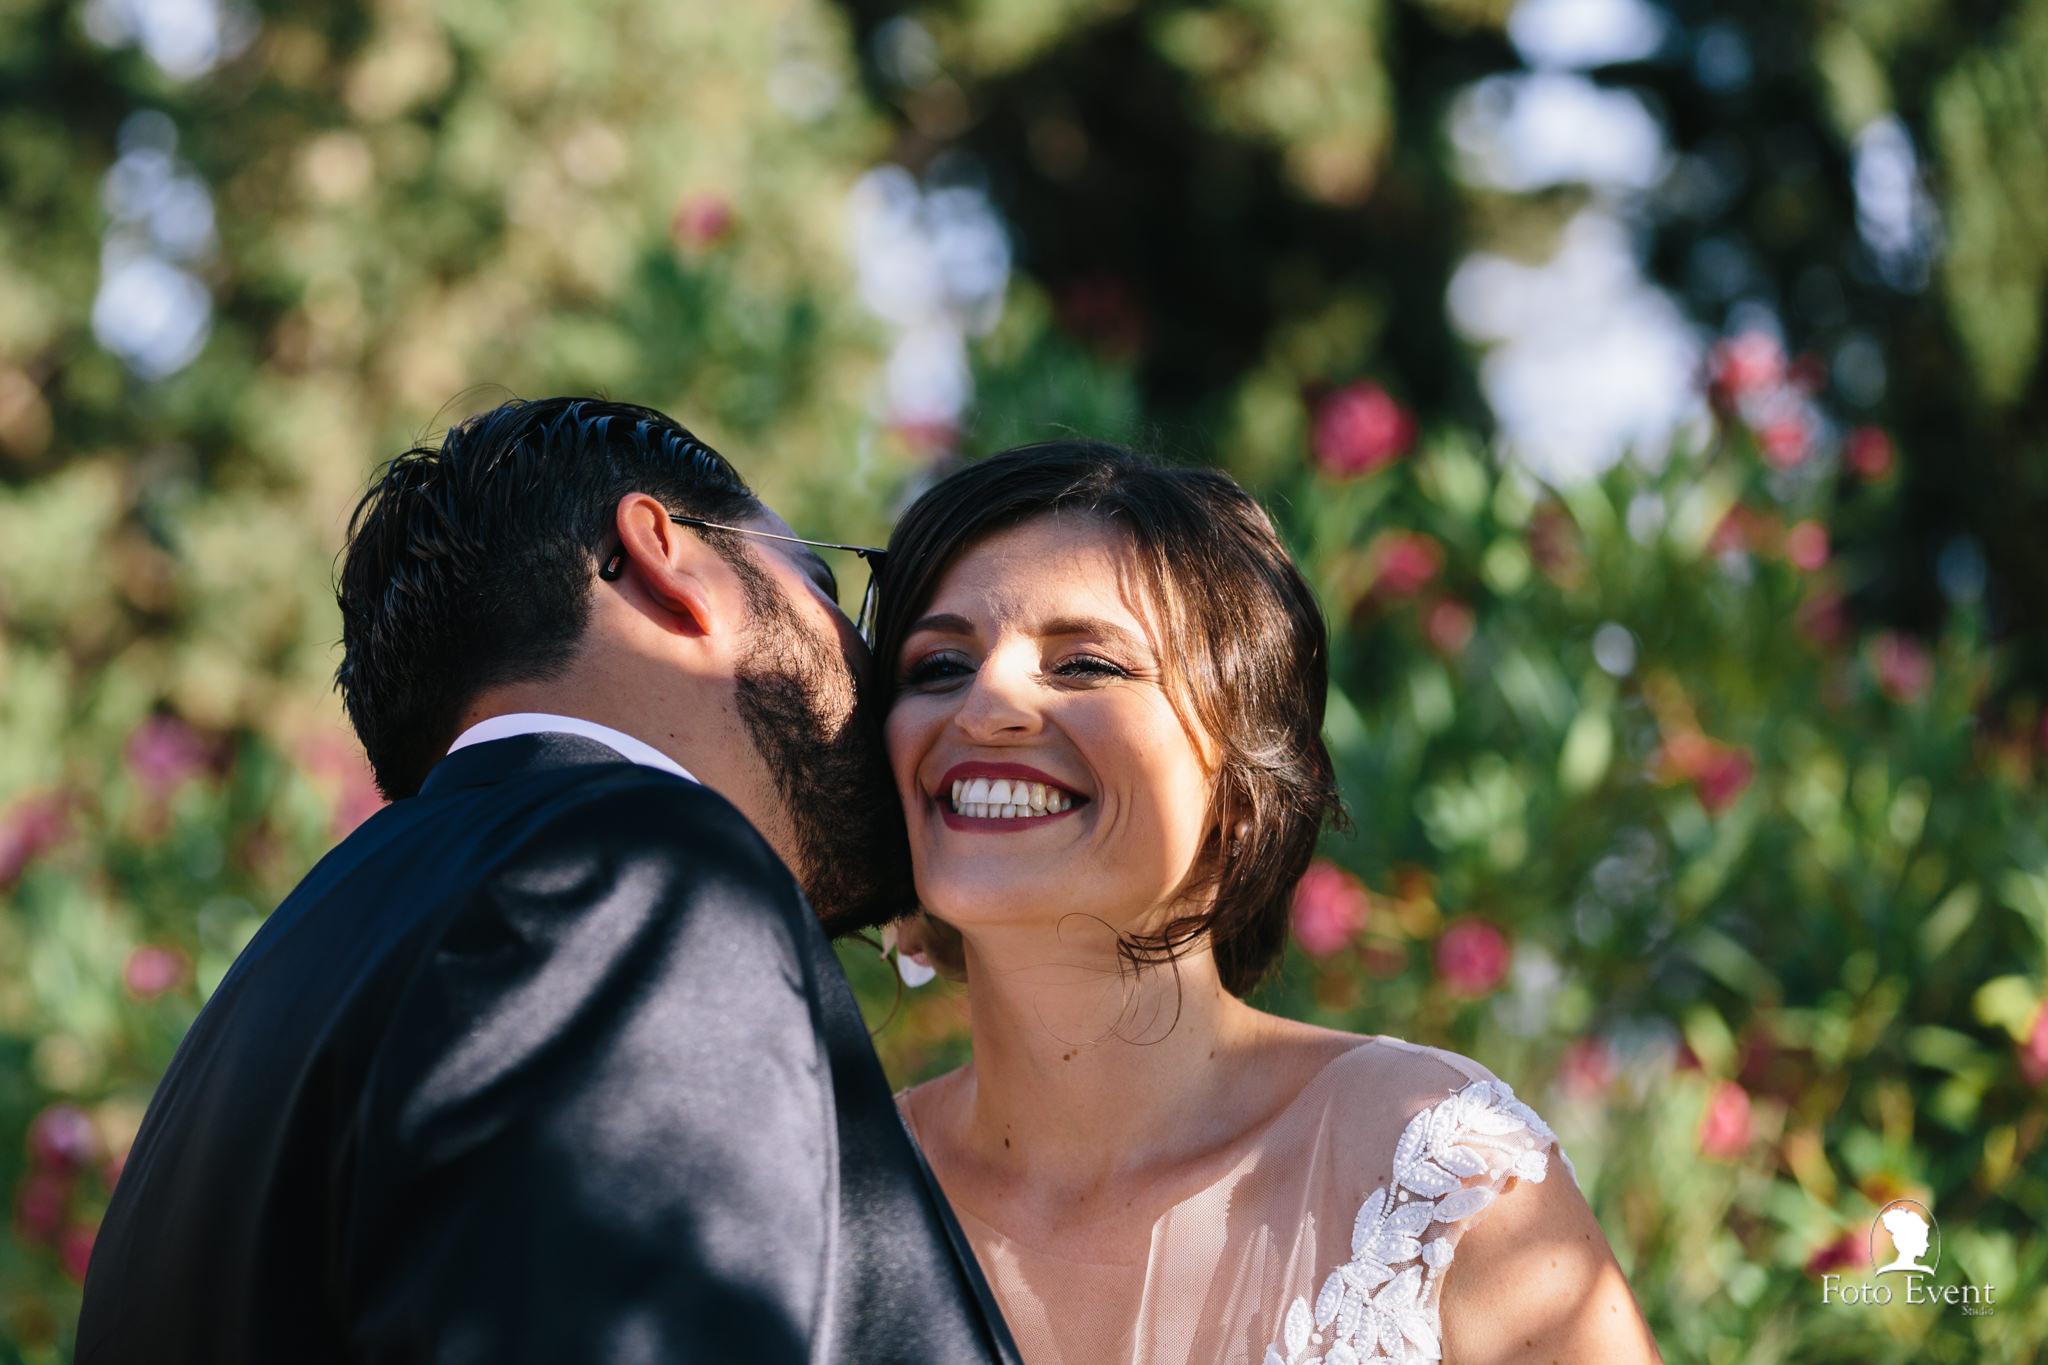 027-2019-09-09-Matrimonio-Dorotea-e-Alberto-Iemmolo-zoom-417